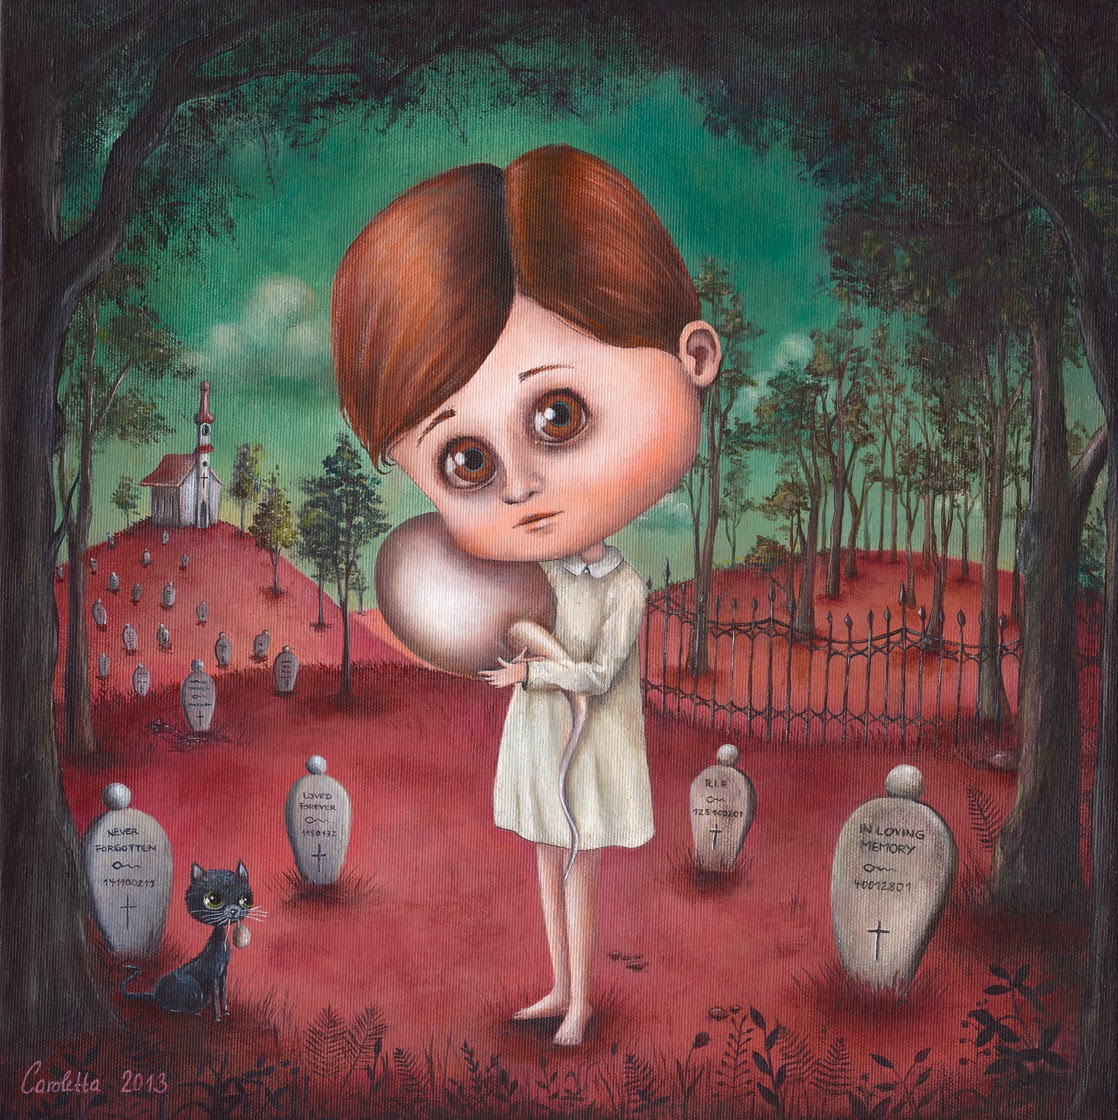 http://de.dawanda.com/product/57941487-Sperm-Cemetery---Druck-auf-MDF